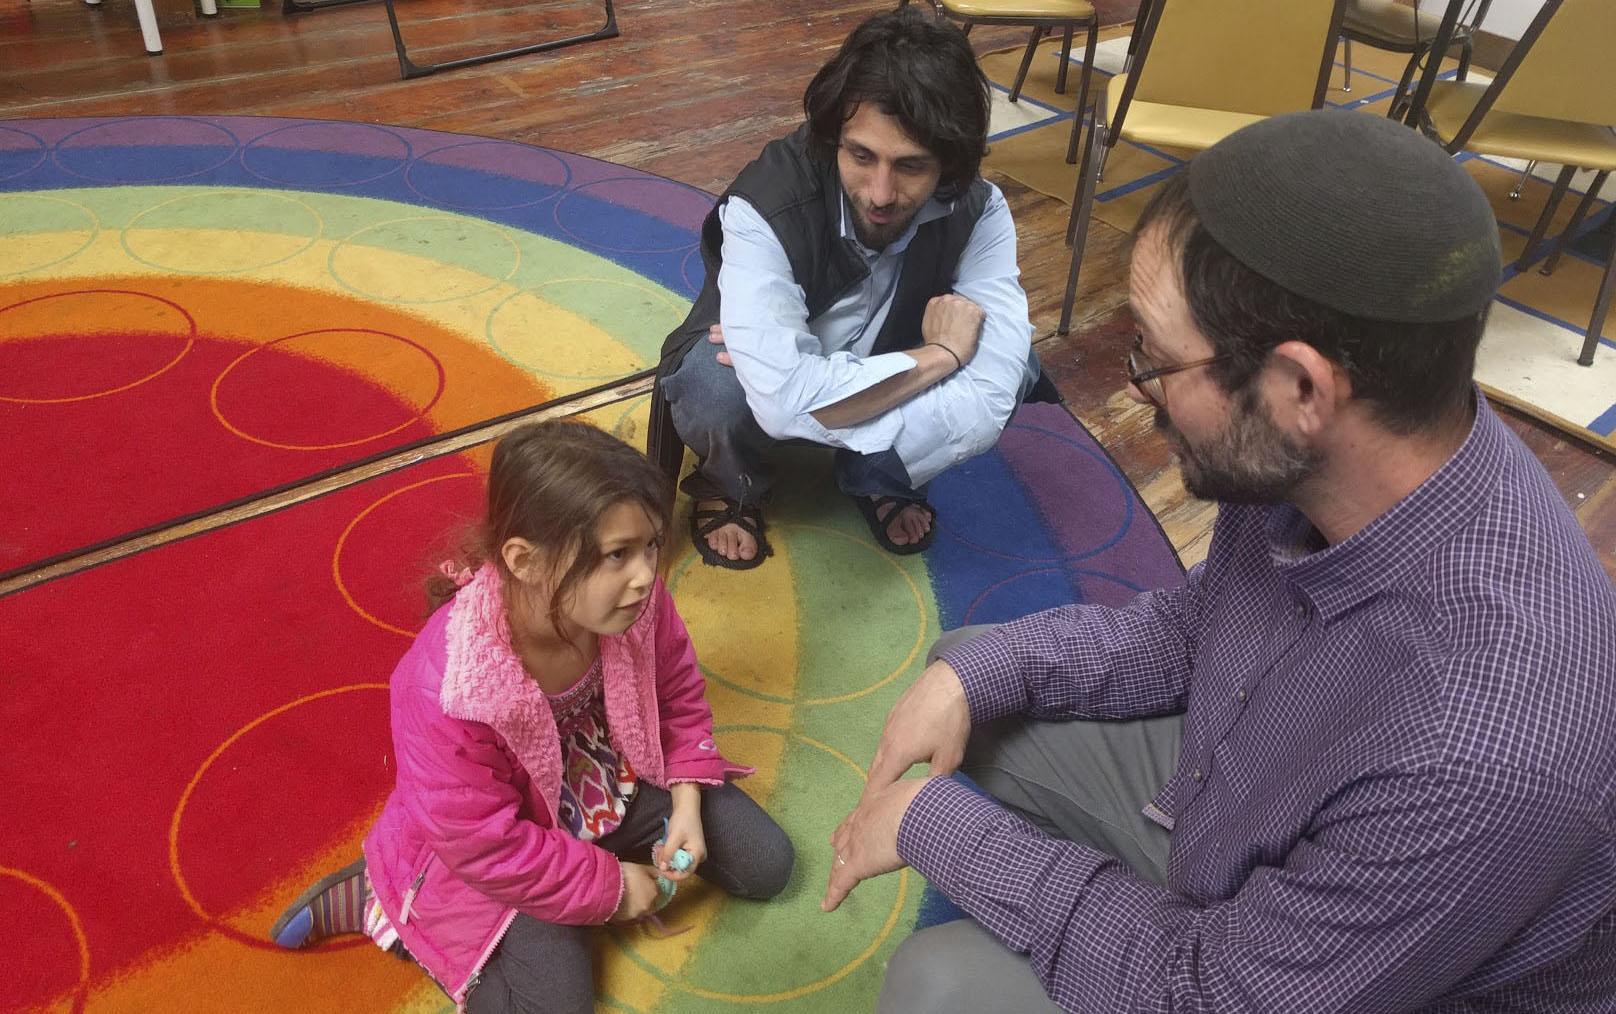 the three sit talking on a bright rainbow rug